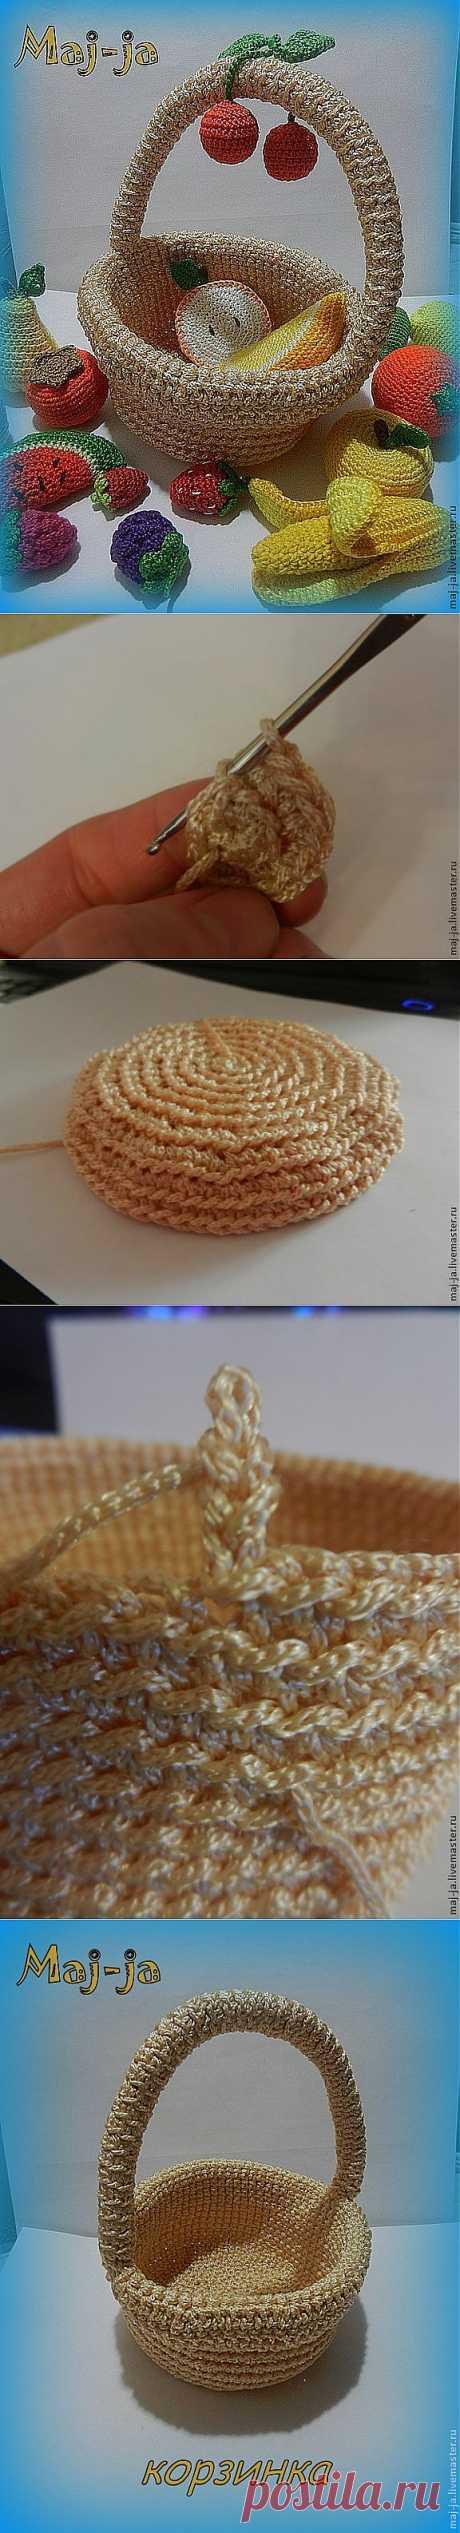 Мастер-класс: вязаная крючком корзинка - Ярмарка Мастеров - ручная работа, handmade